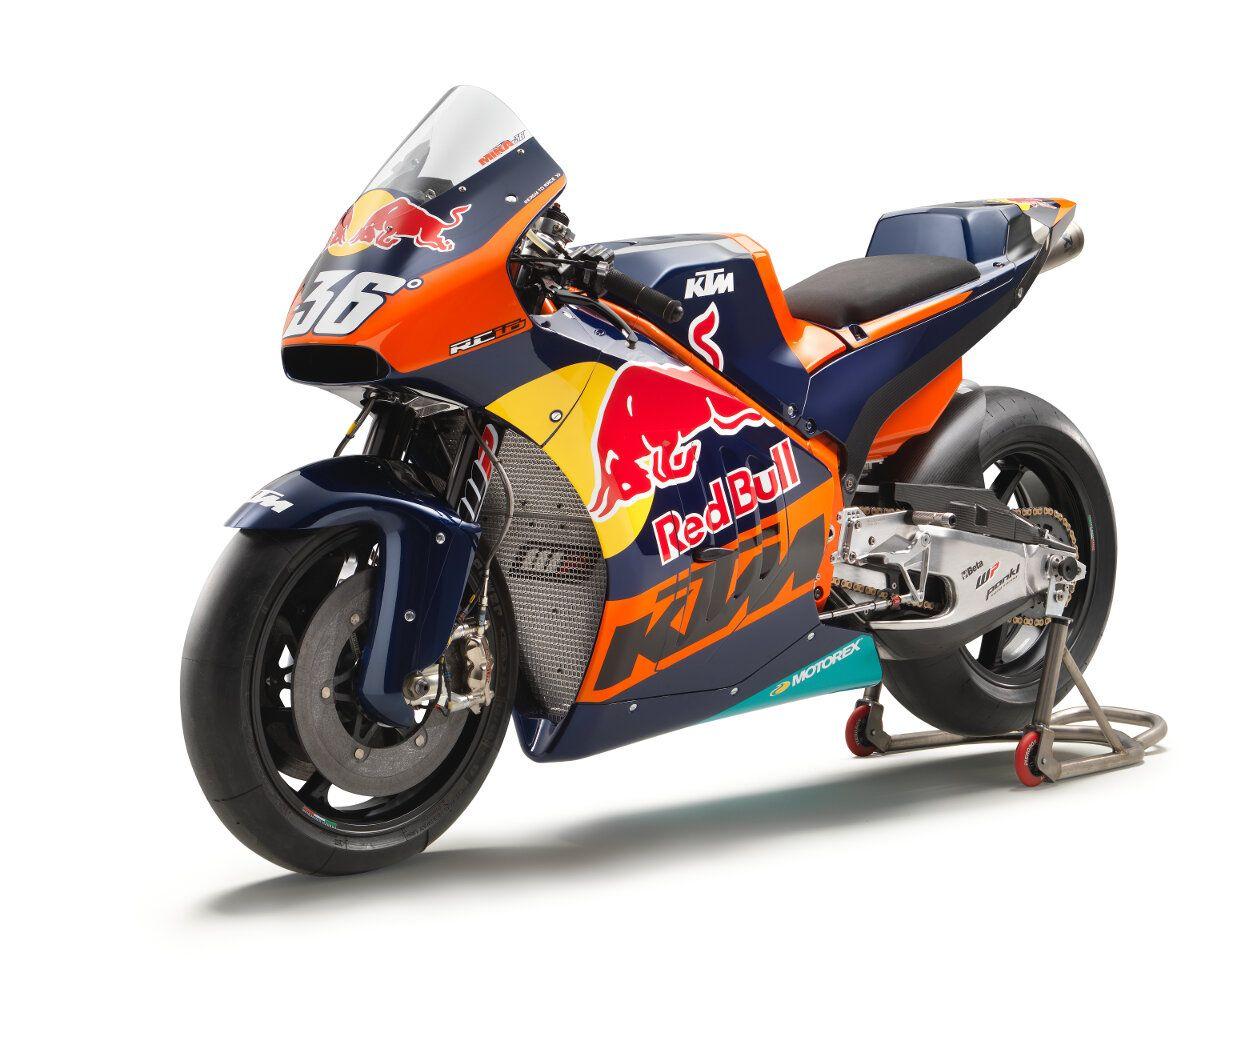 Ktm Rc16 Motogp Bike Gets Official Outing Rescogs Ktm Racing Bikes Motorcycle